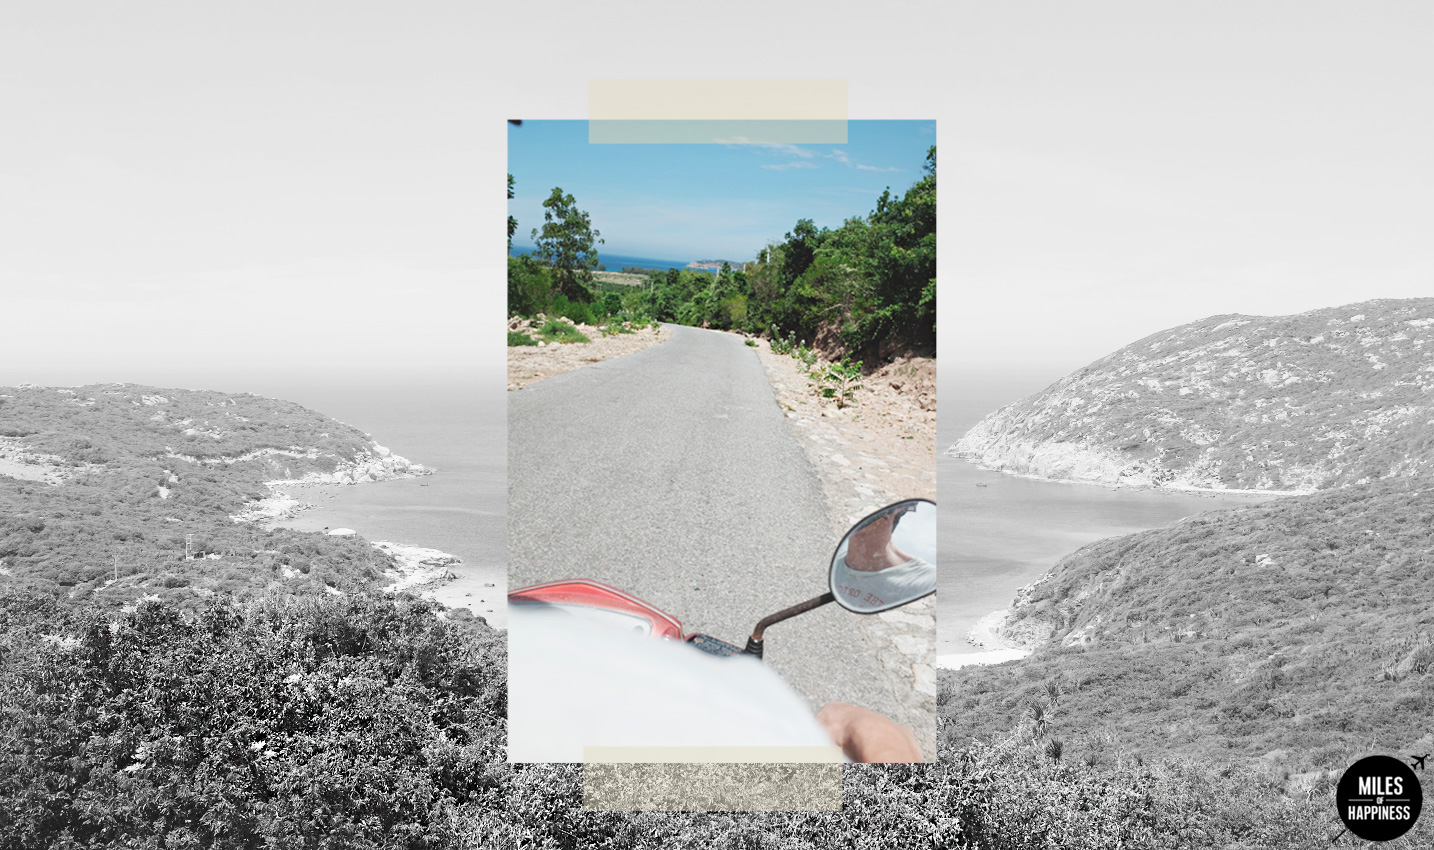 Wonderful Vietnam: Driving on the Vinh Hy-Binh Tien Pass